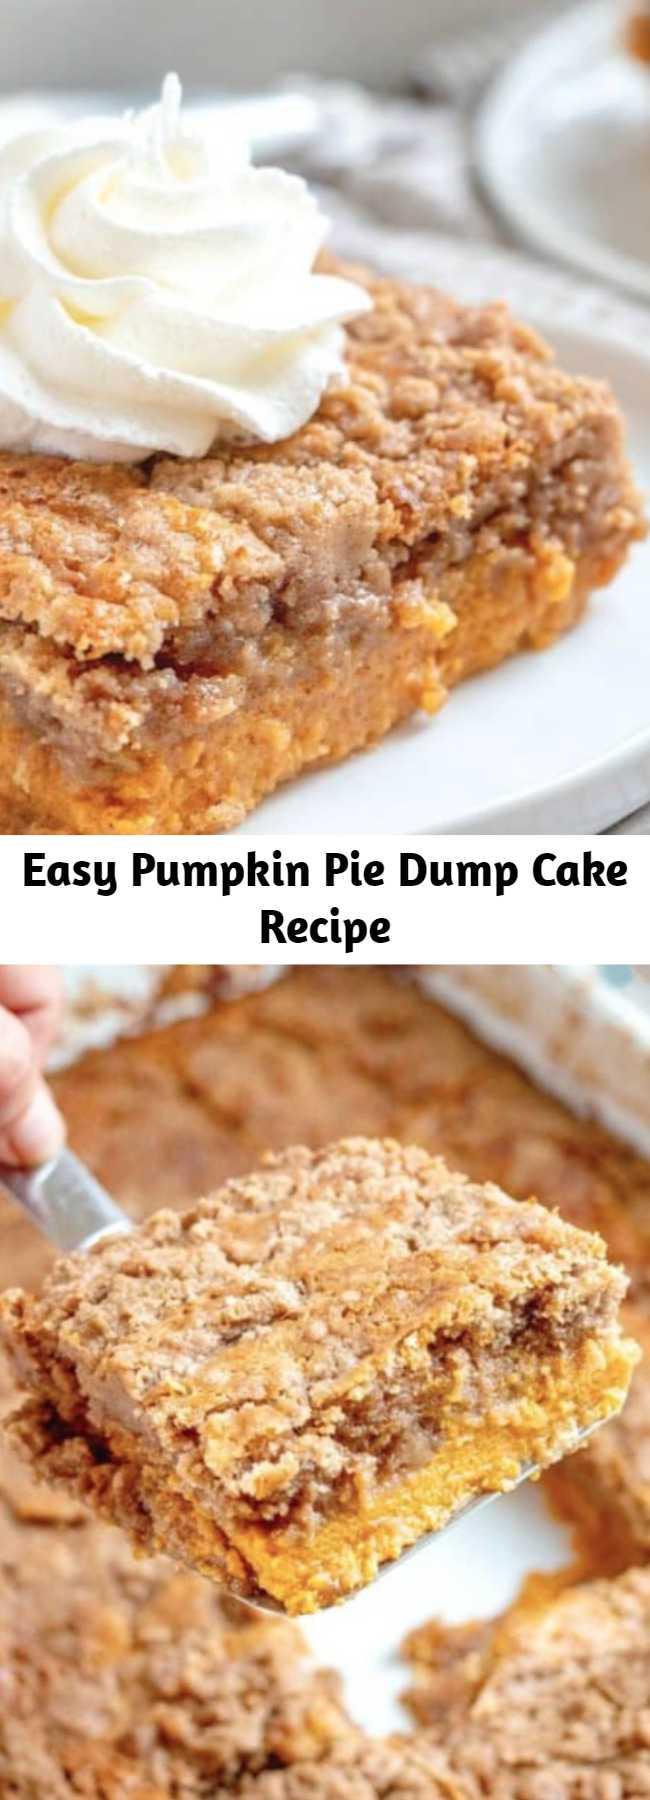 Easy Pumpkin Pie Dump Cake Recipe - Pumpkin Pie Dump Cake gets it's name by dumping the ingredients into the baking dish. It is like a pumpkin pie and a spice cake all in one! #Pumpkin #Pie #DumpCake #Fall #Dessert